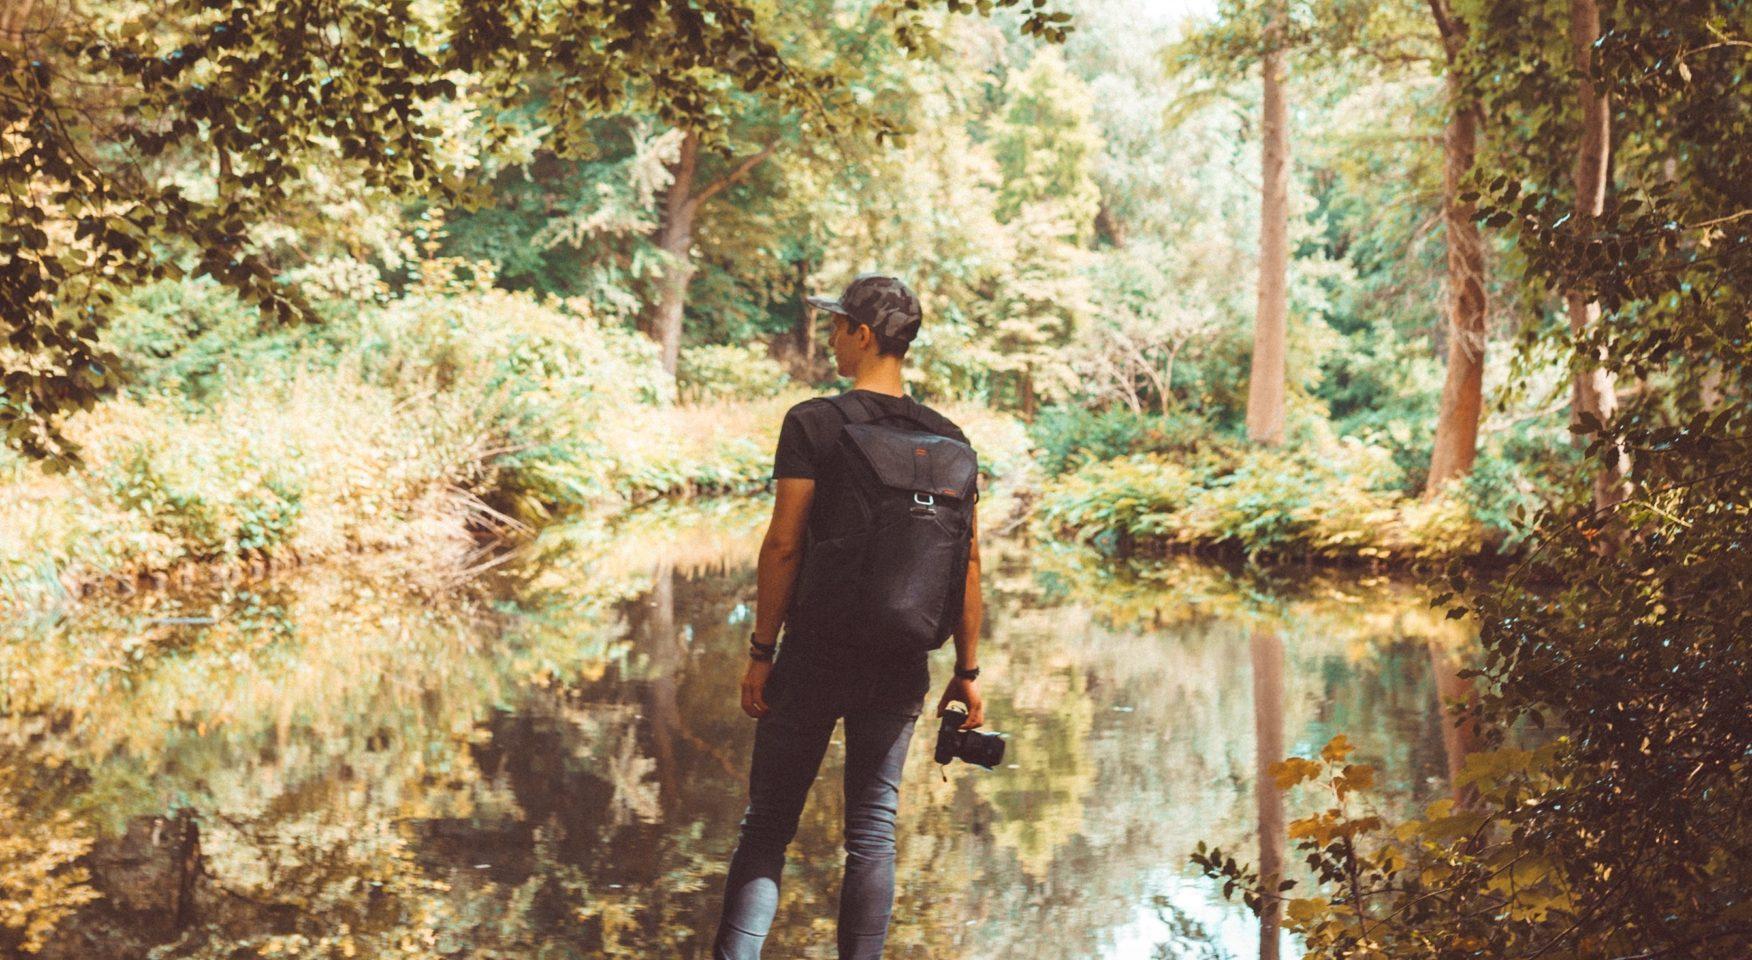 Man wearing backpack and holding camera walking through swamp